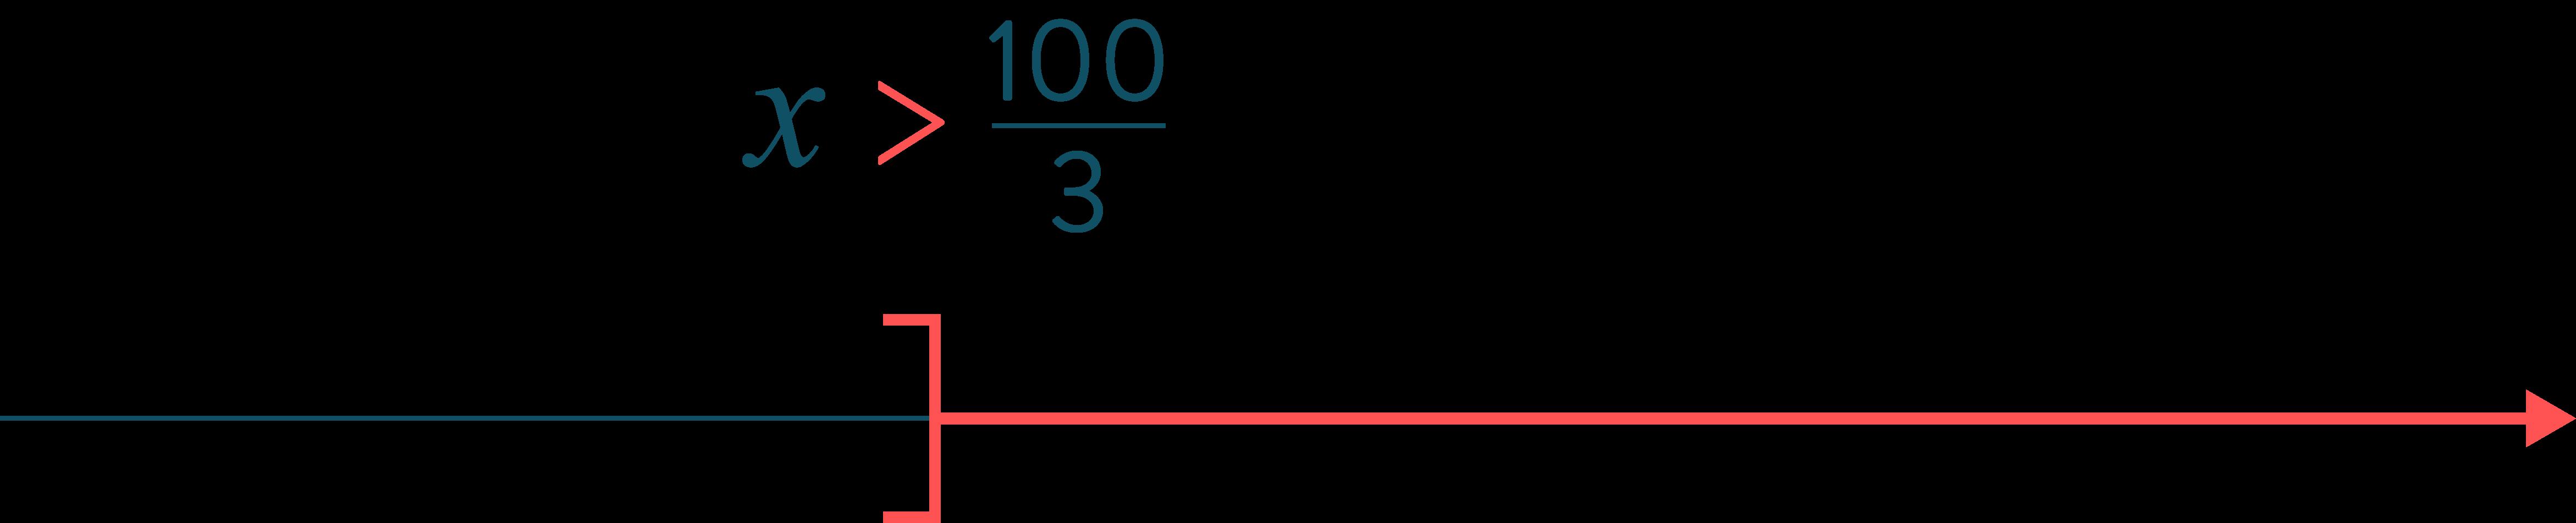 maths inéquation calcul littéral x